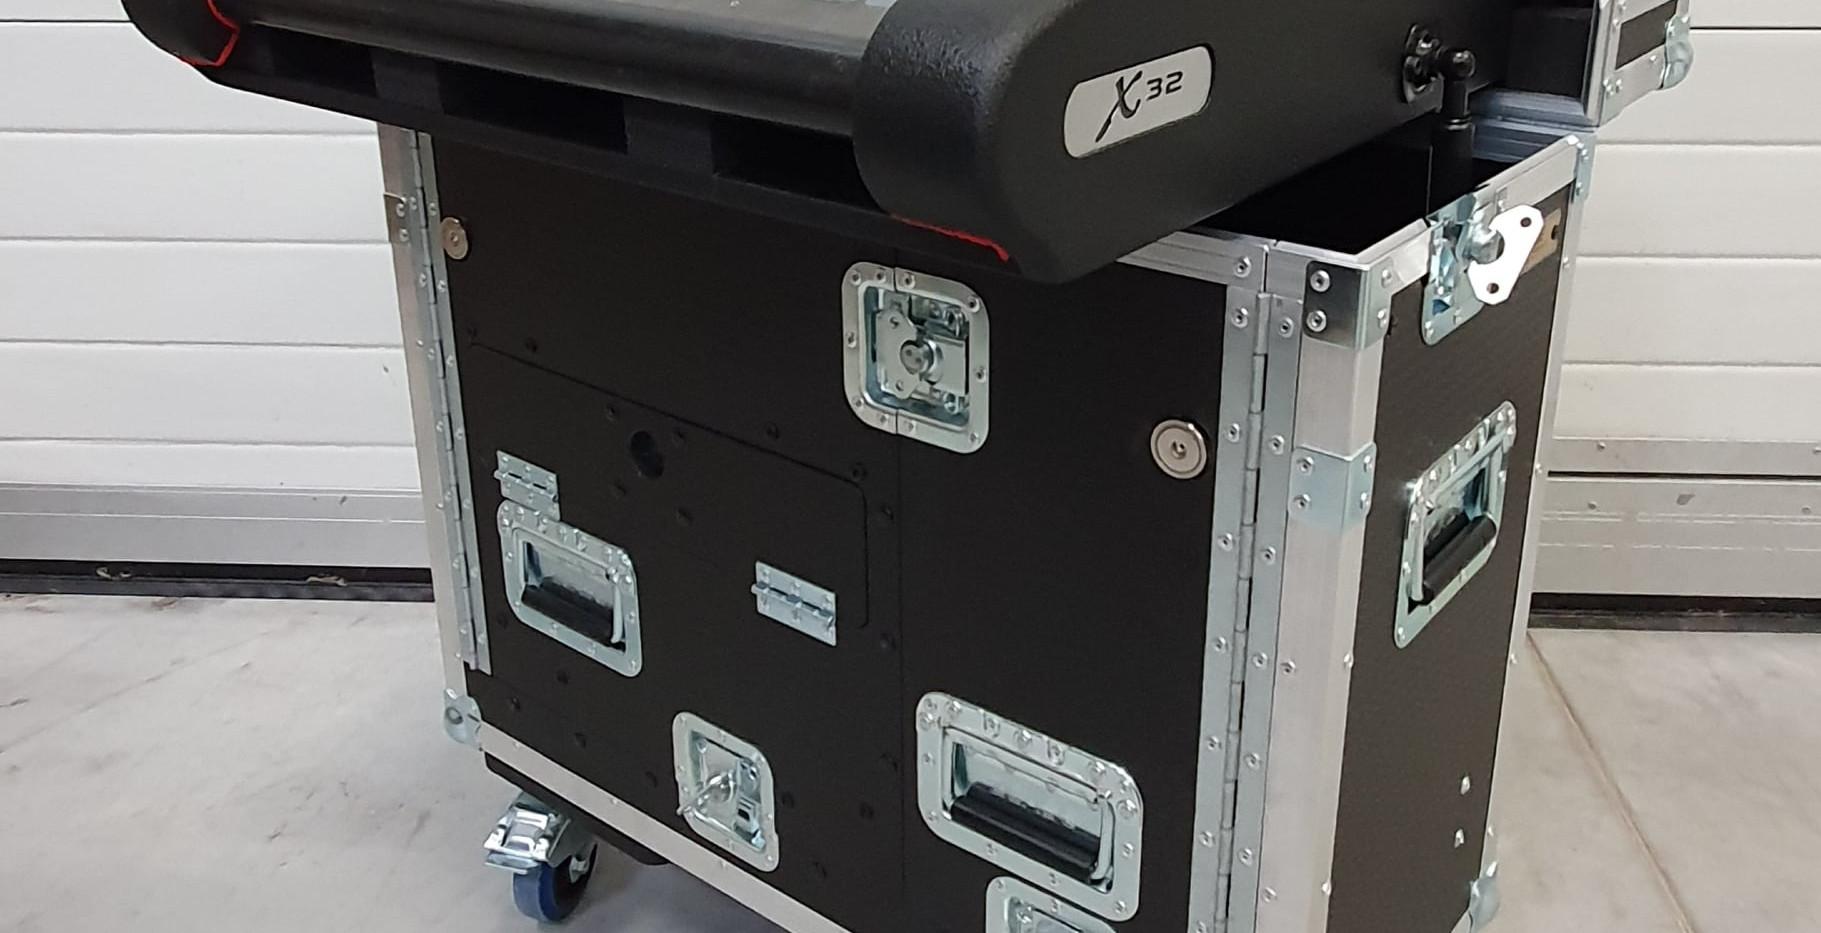 X32 Compact1.jpg